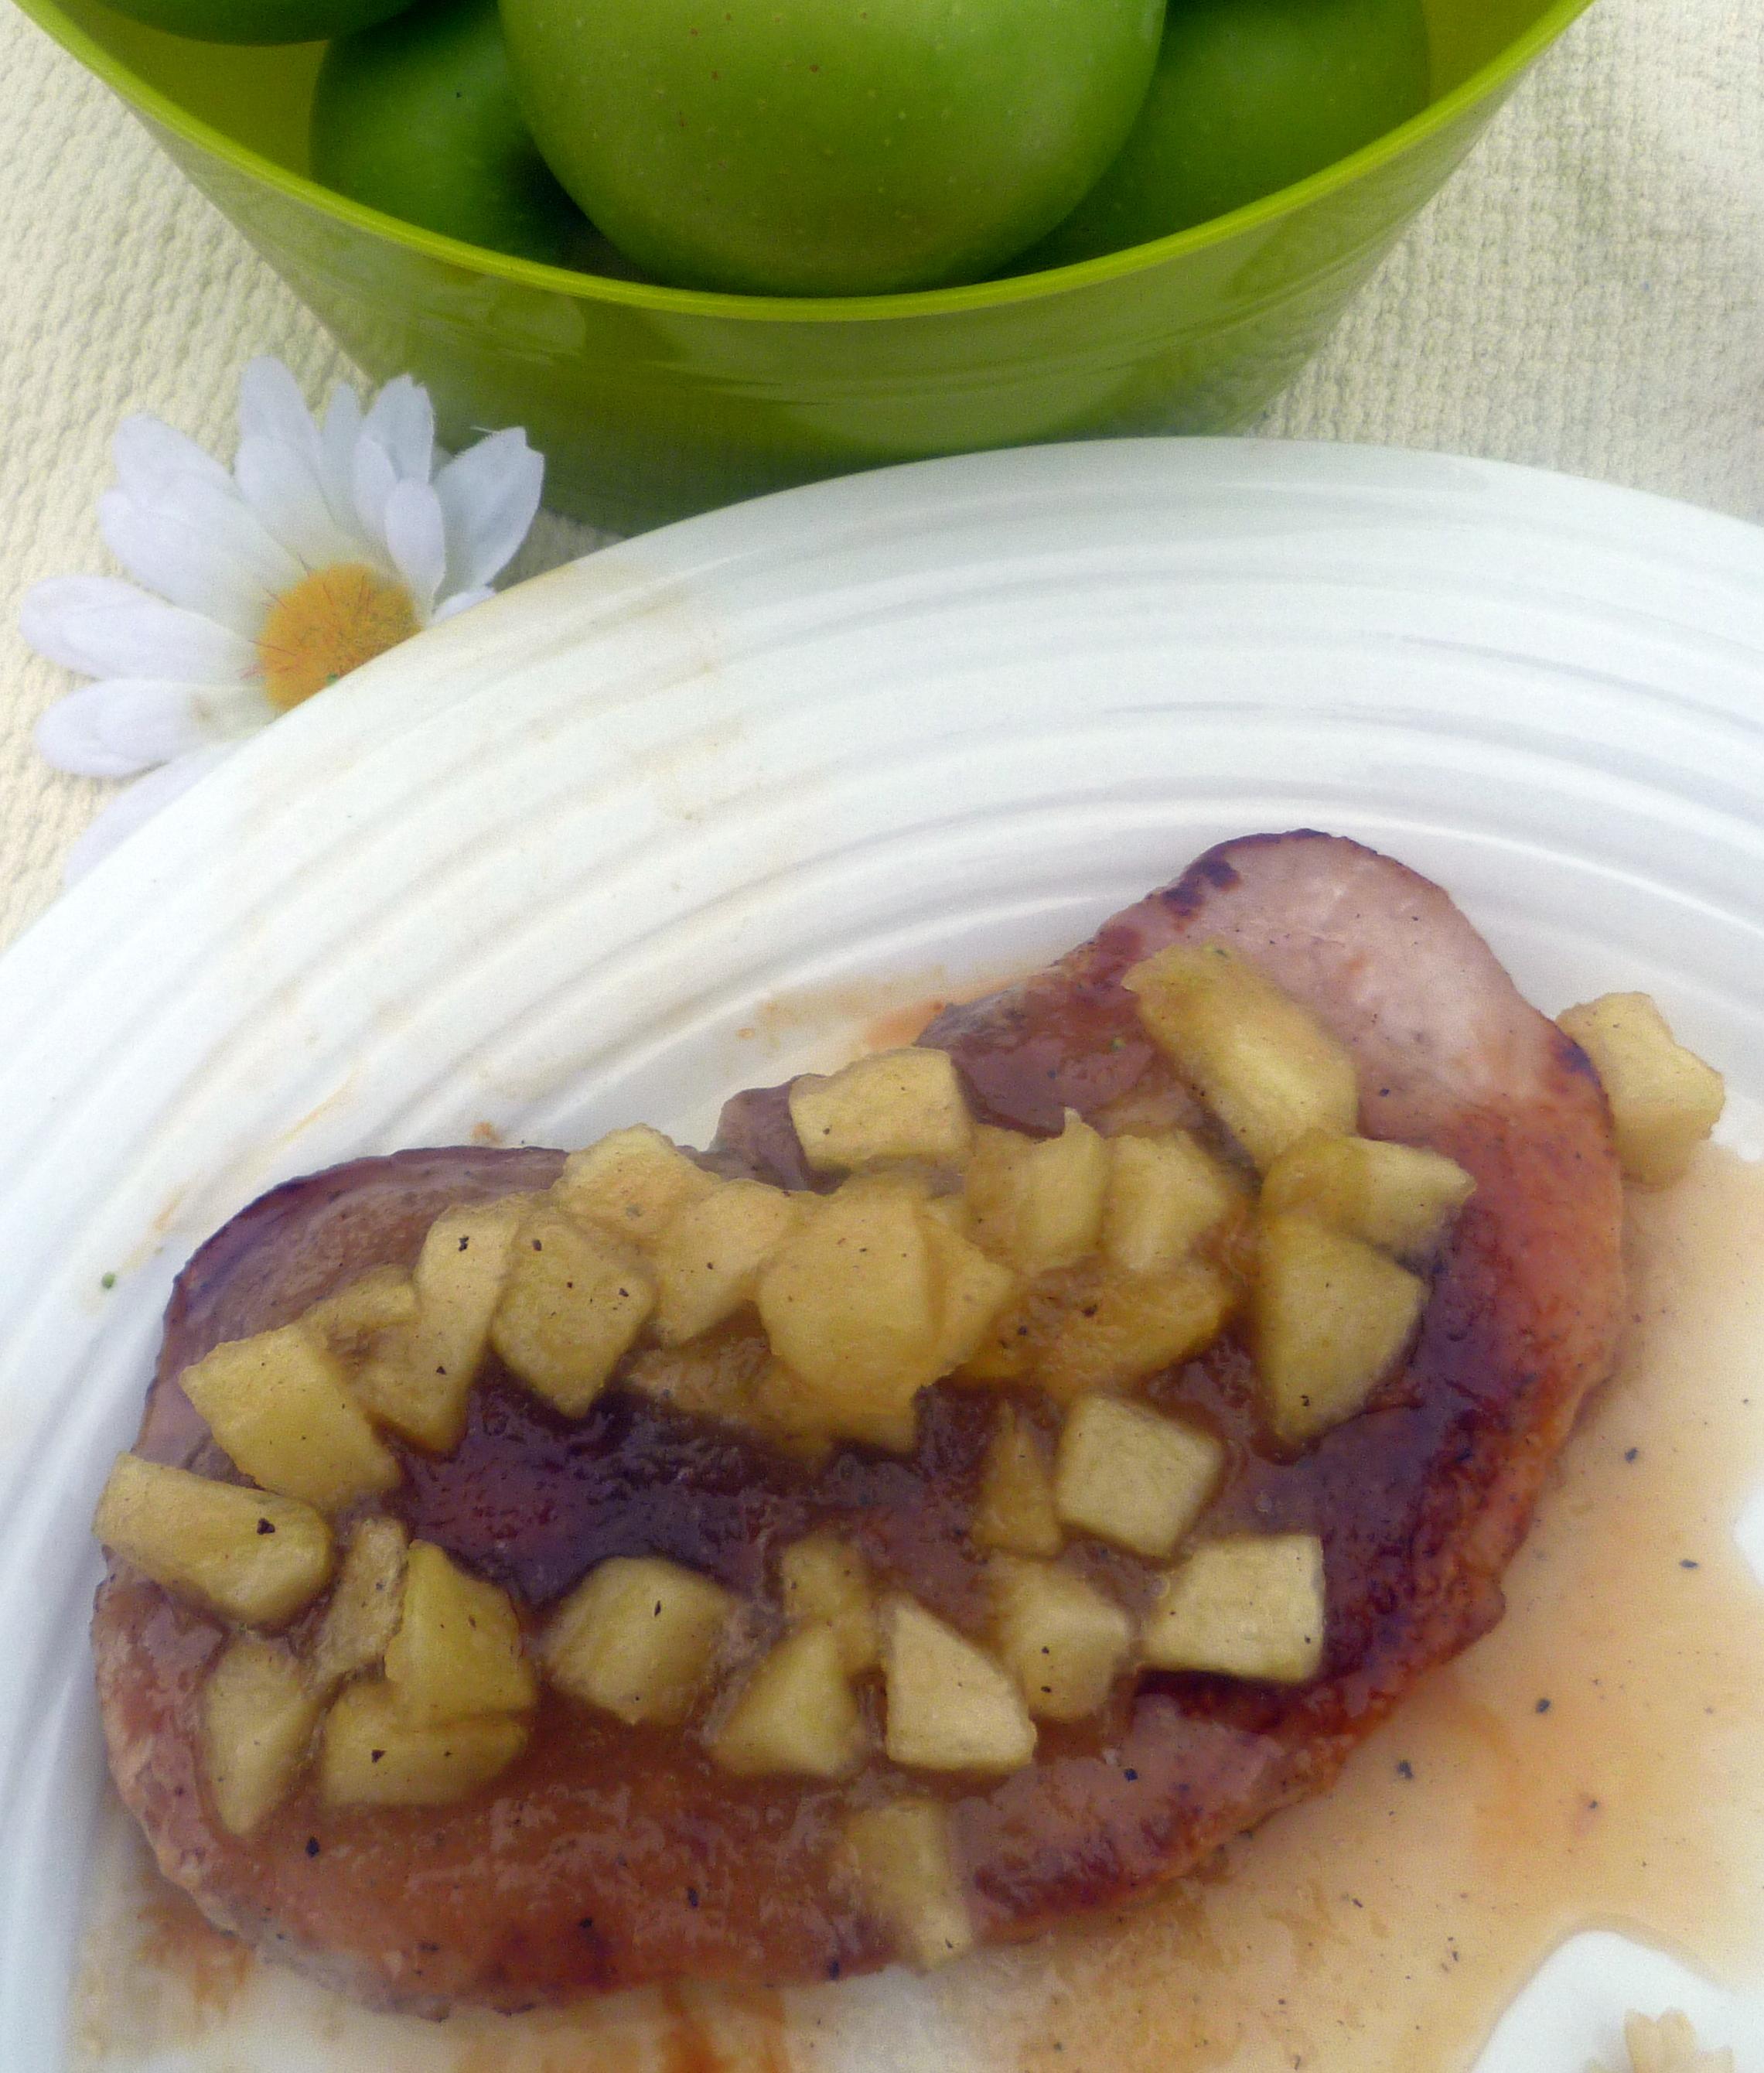 Pork Chop with Apple Garnish Sauce